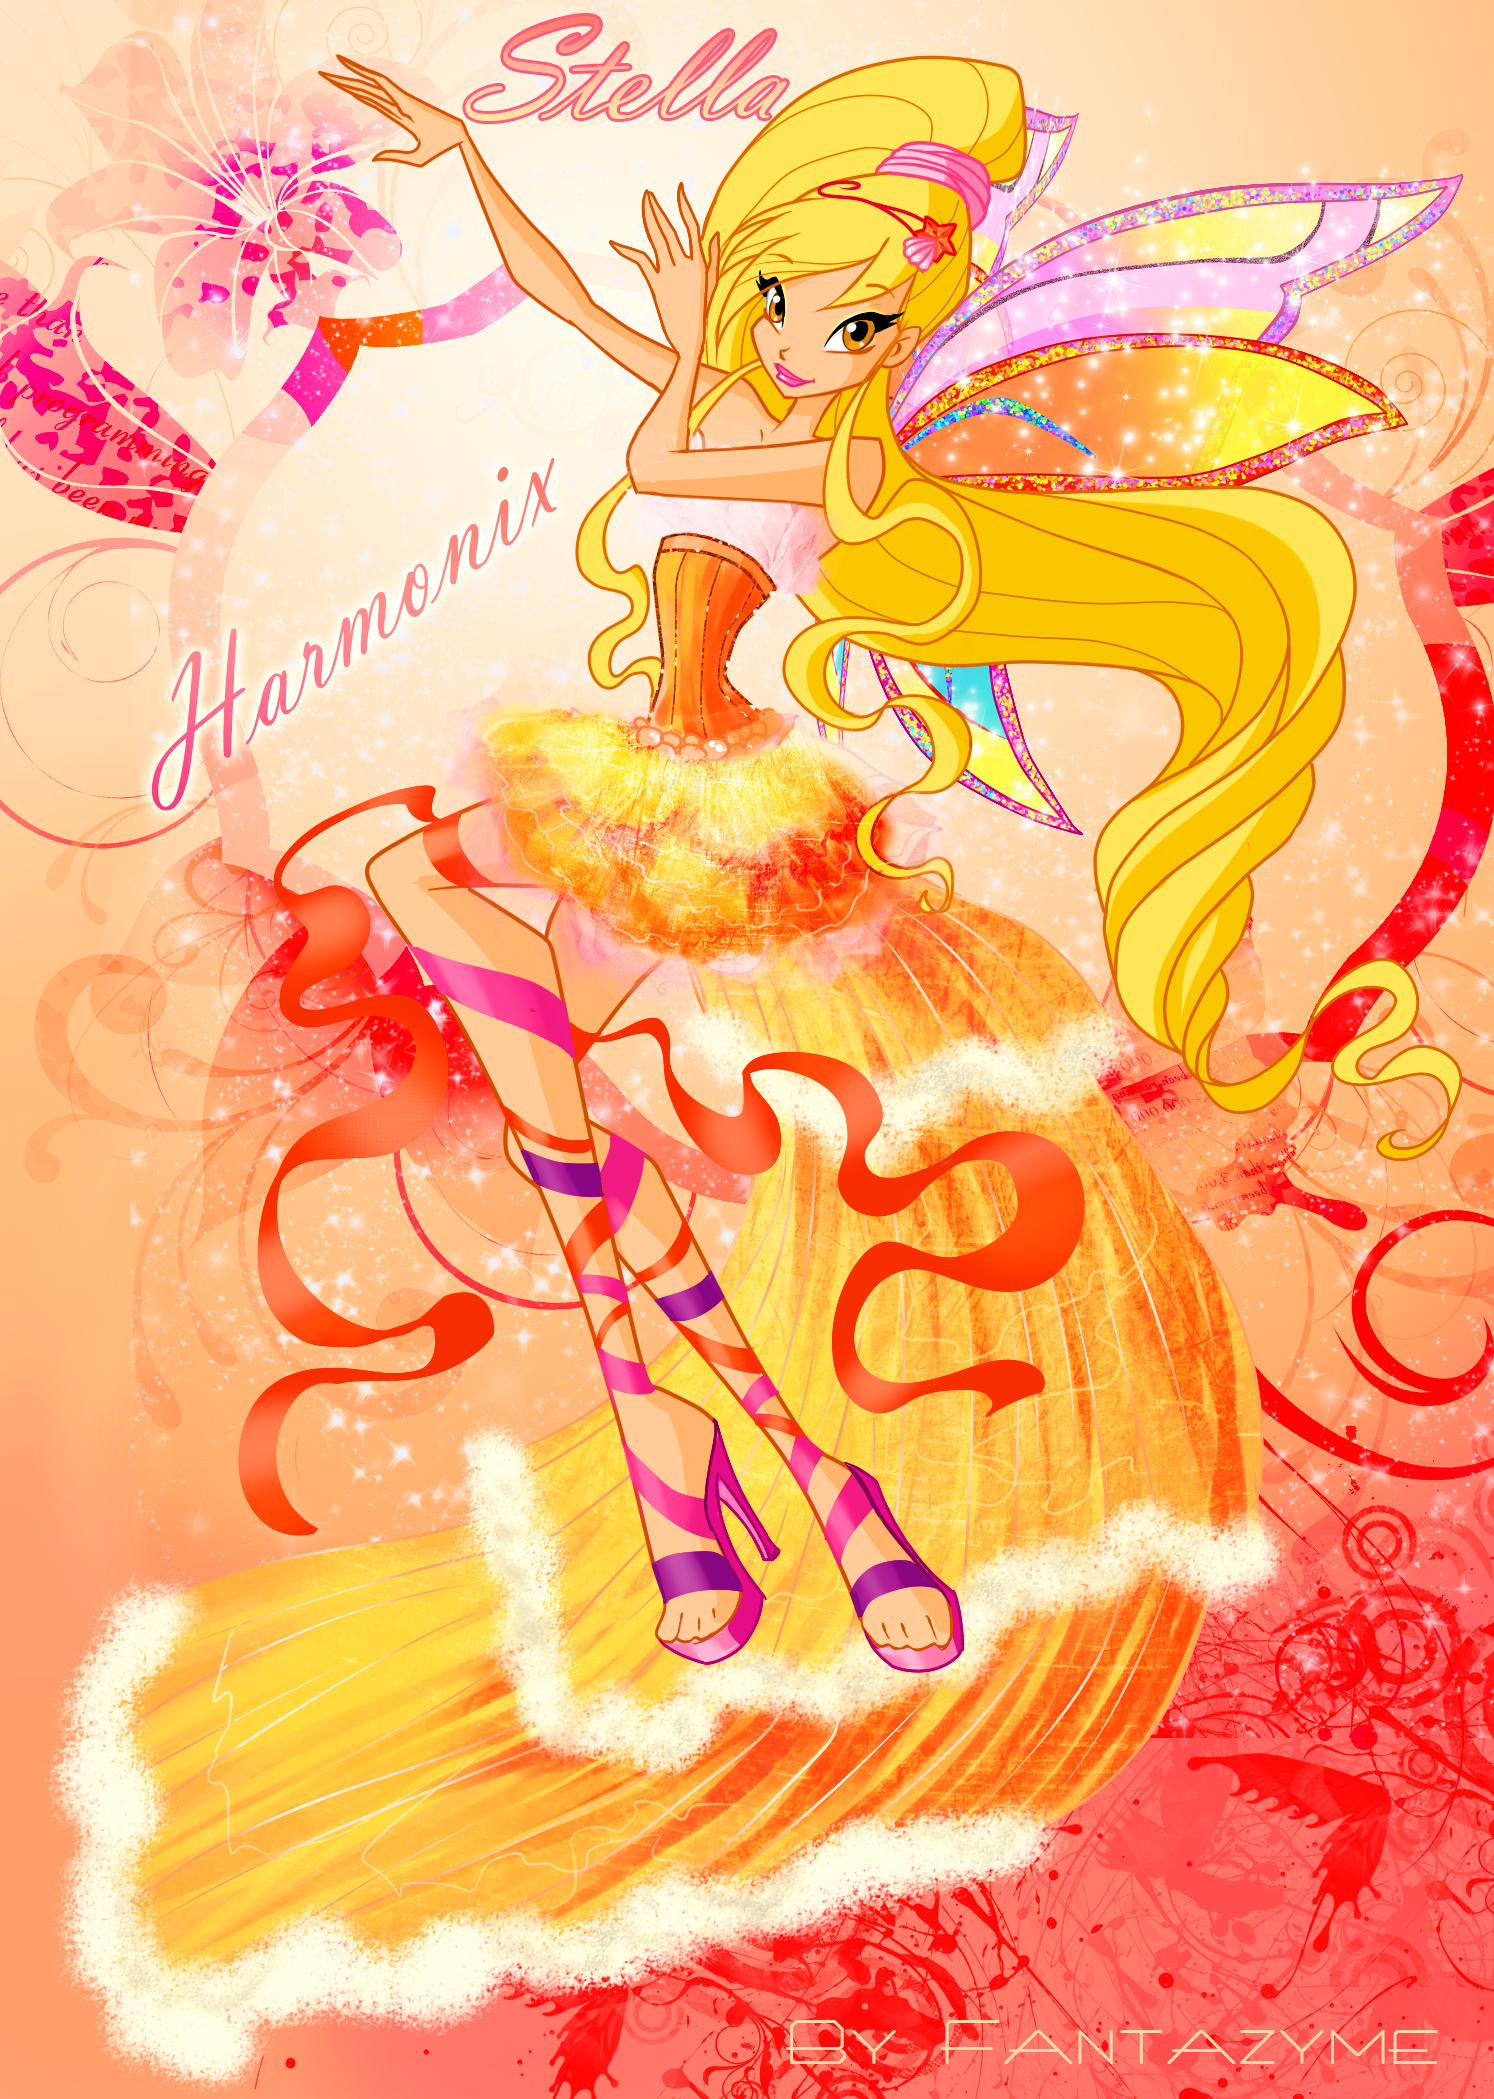 http://fc02.deviantart.net/fs71/f/2012/319/3/3/stella_full_harmonix_by_fantazyme-d4uvi5c.jpg